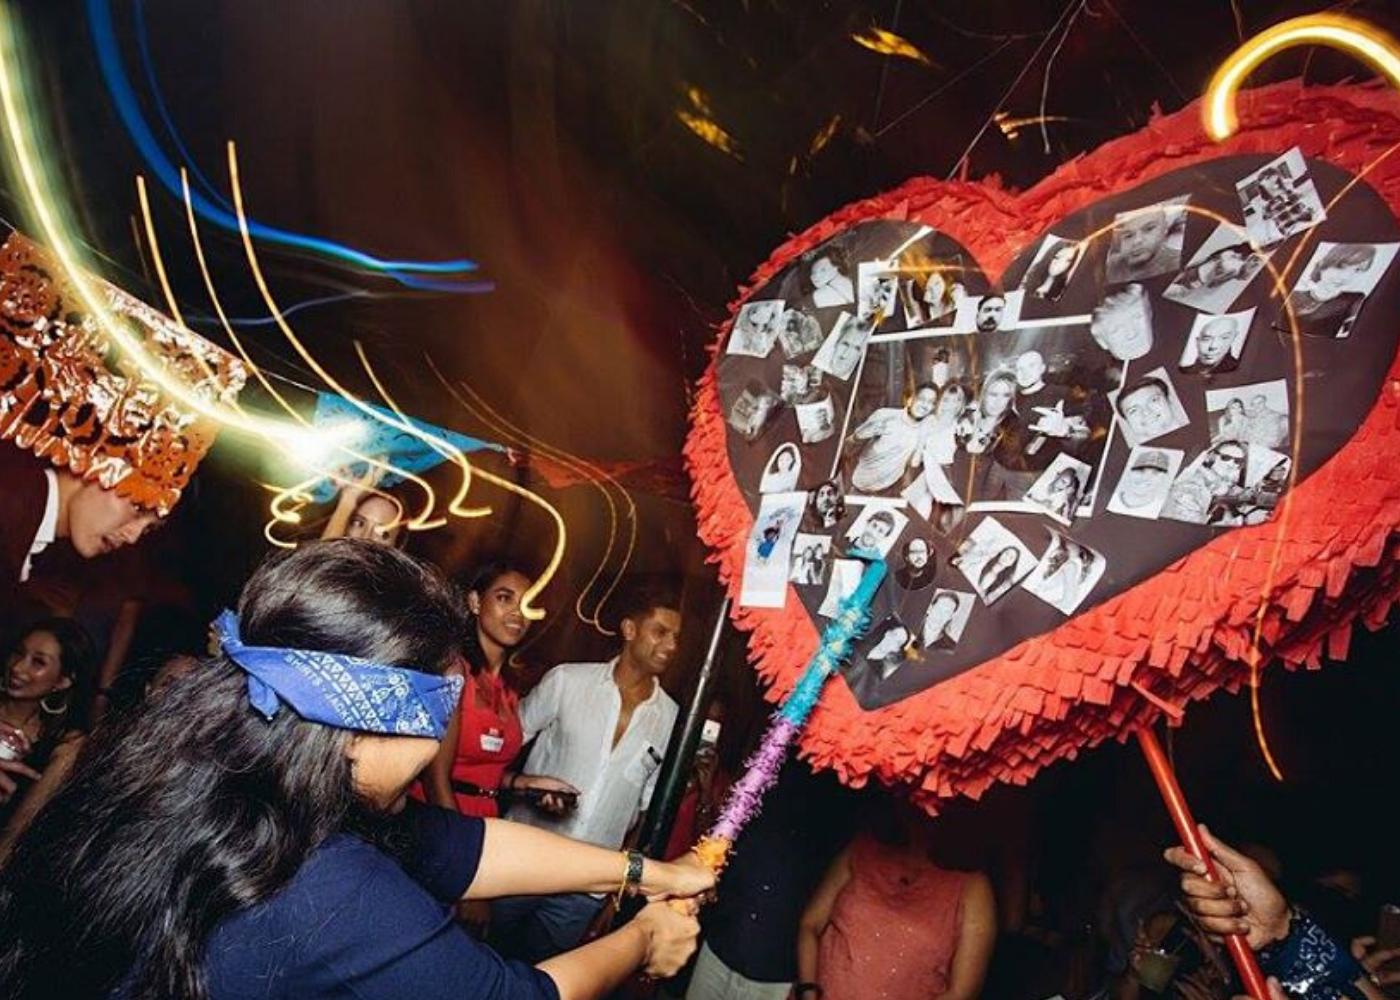 Hearts Go Loco: The Kinky Edition | Lucha Loco